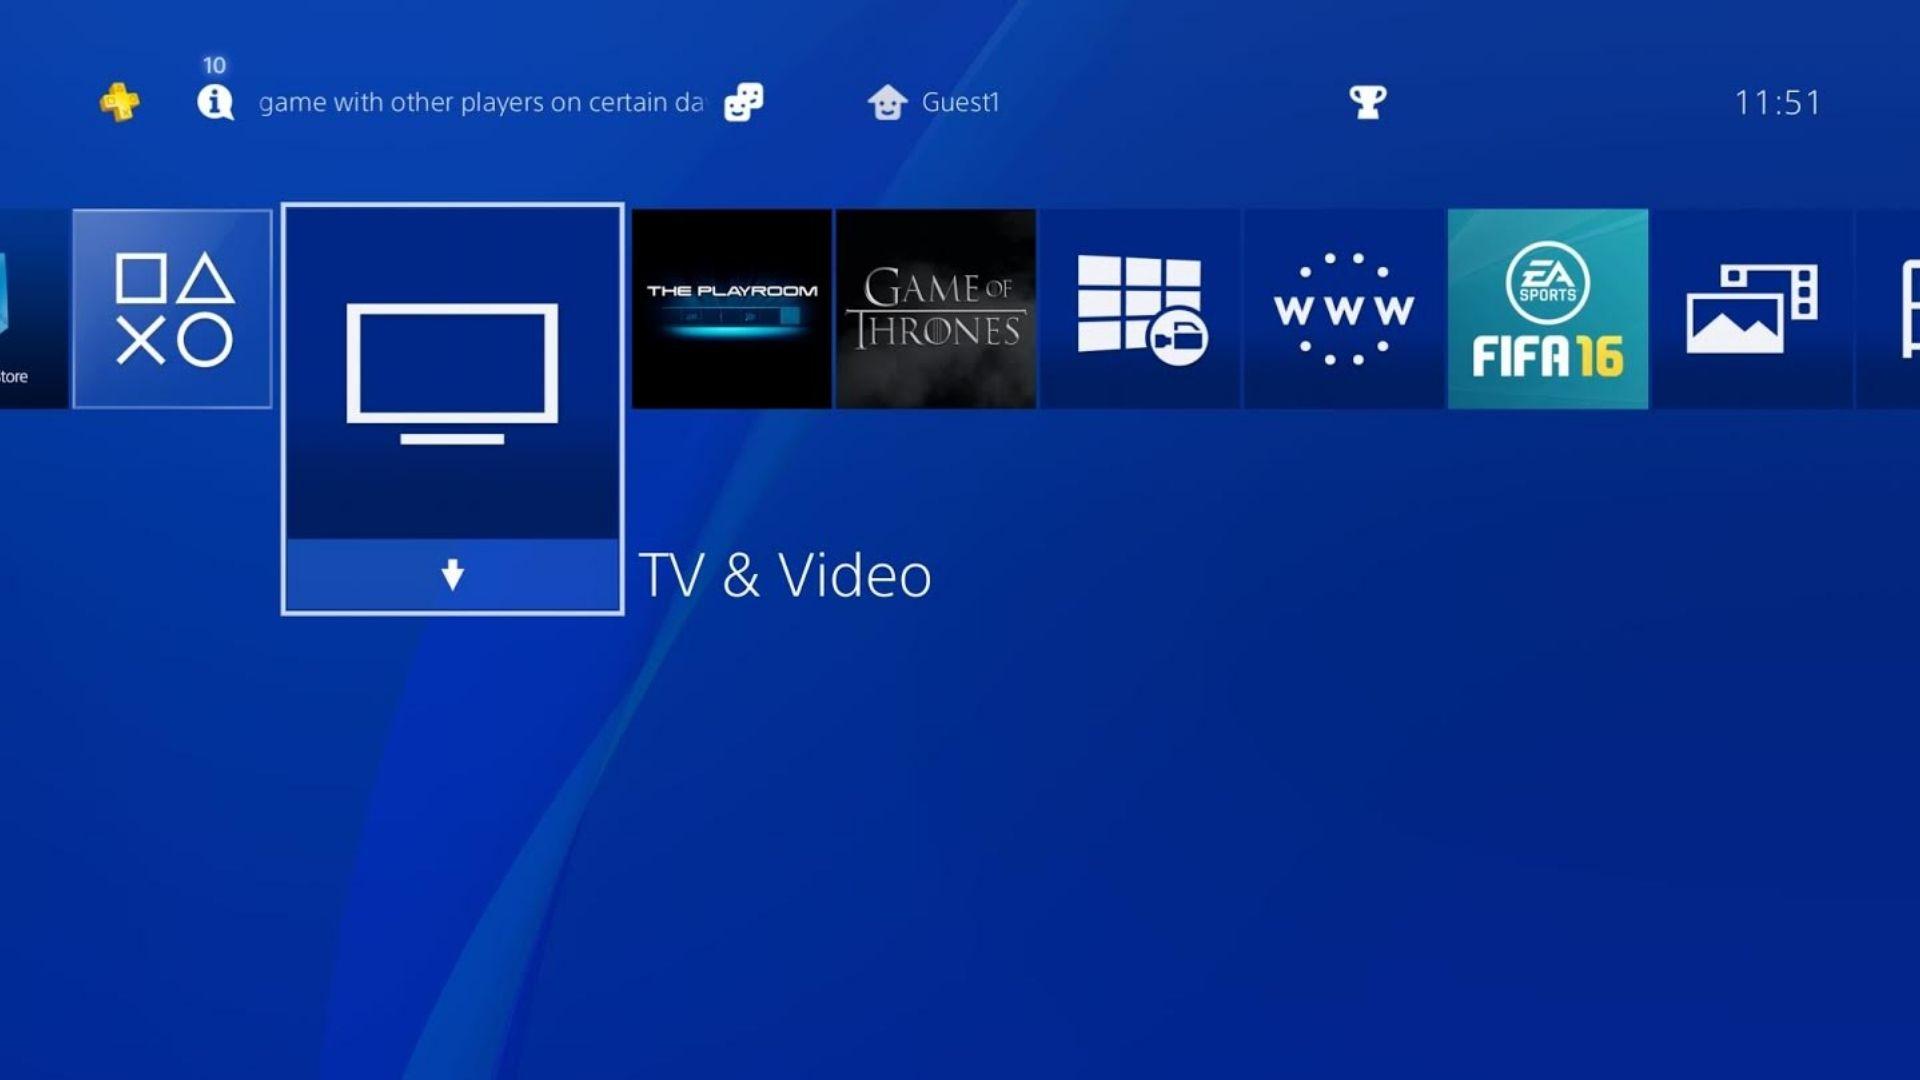 STARZ app for PS4